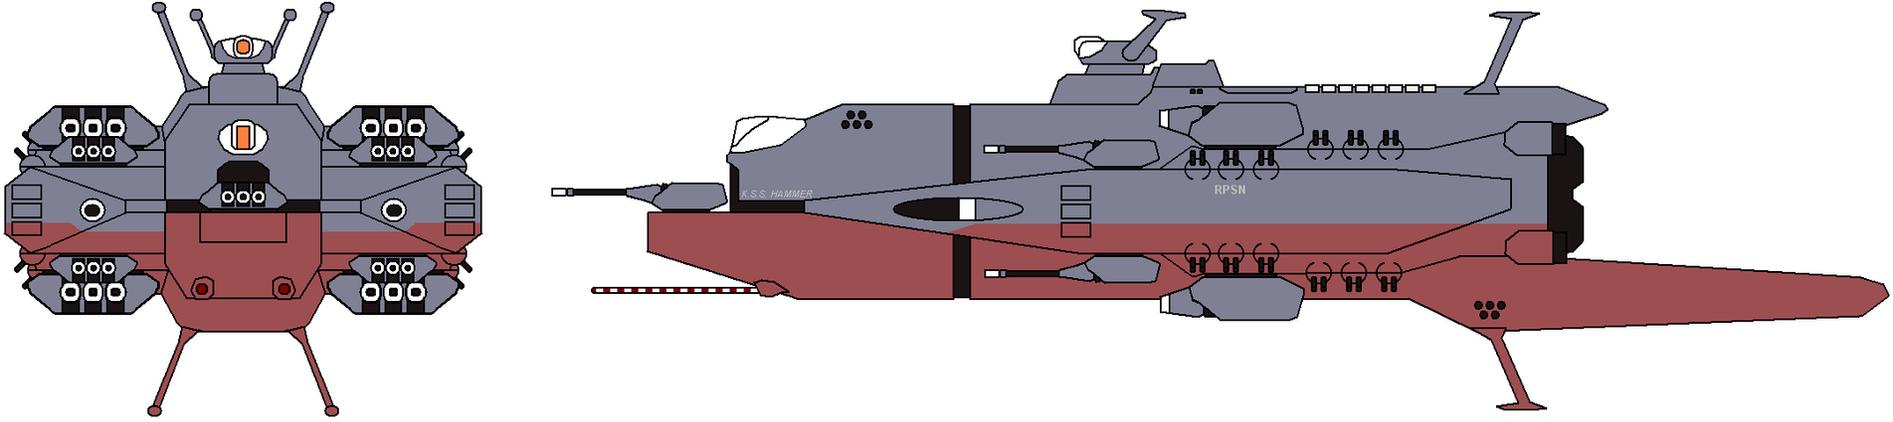 Hammer Class Heavy Cruiser by IgorKutuzov